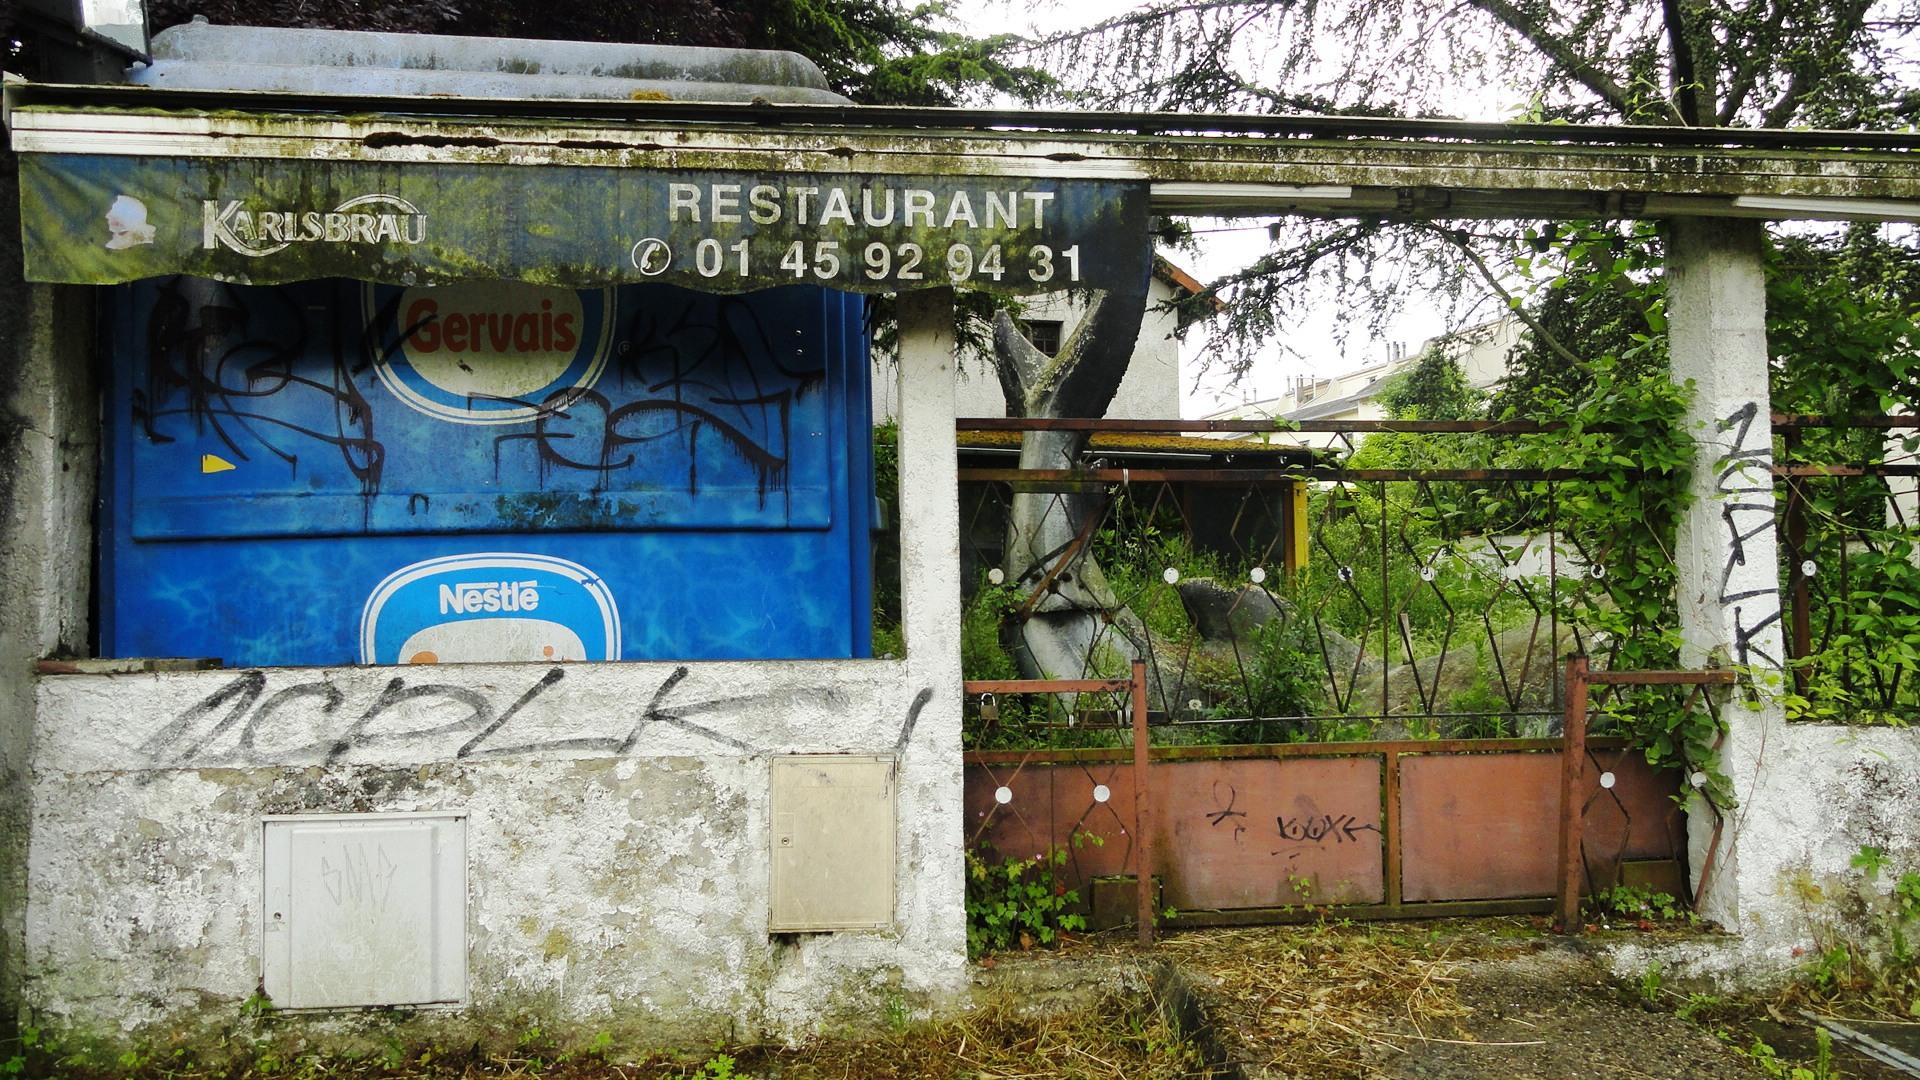 Berges de Marne - Ancien restaurant et sculpture de requin (?)